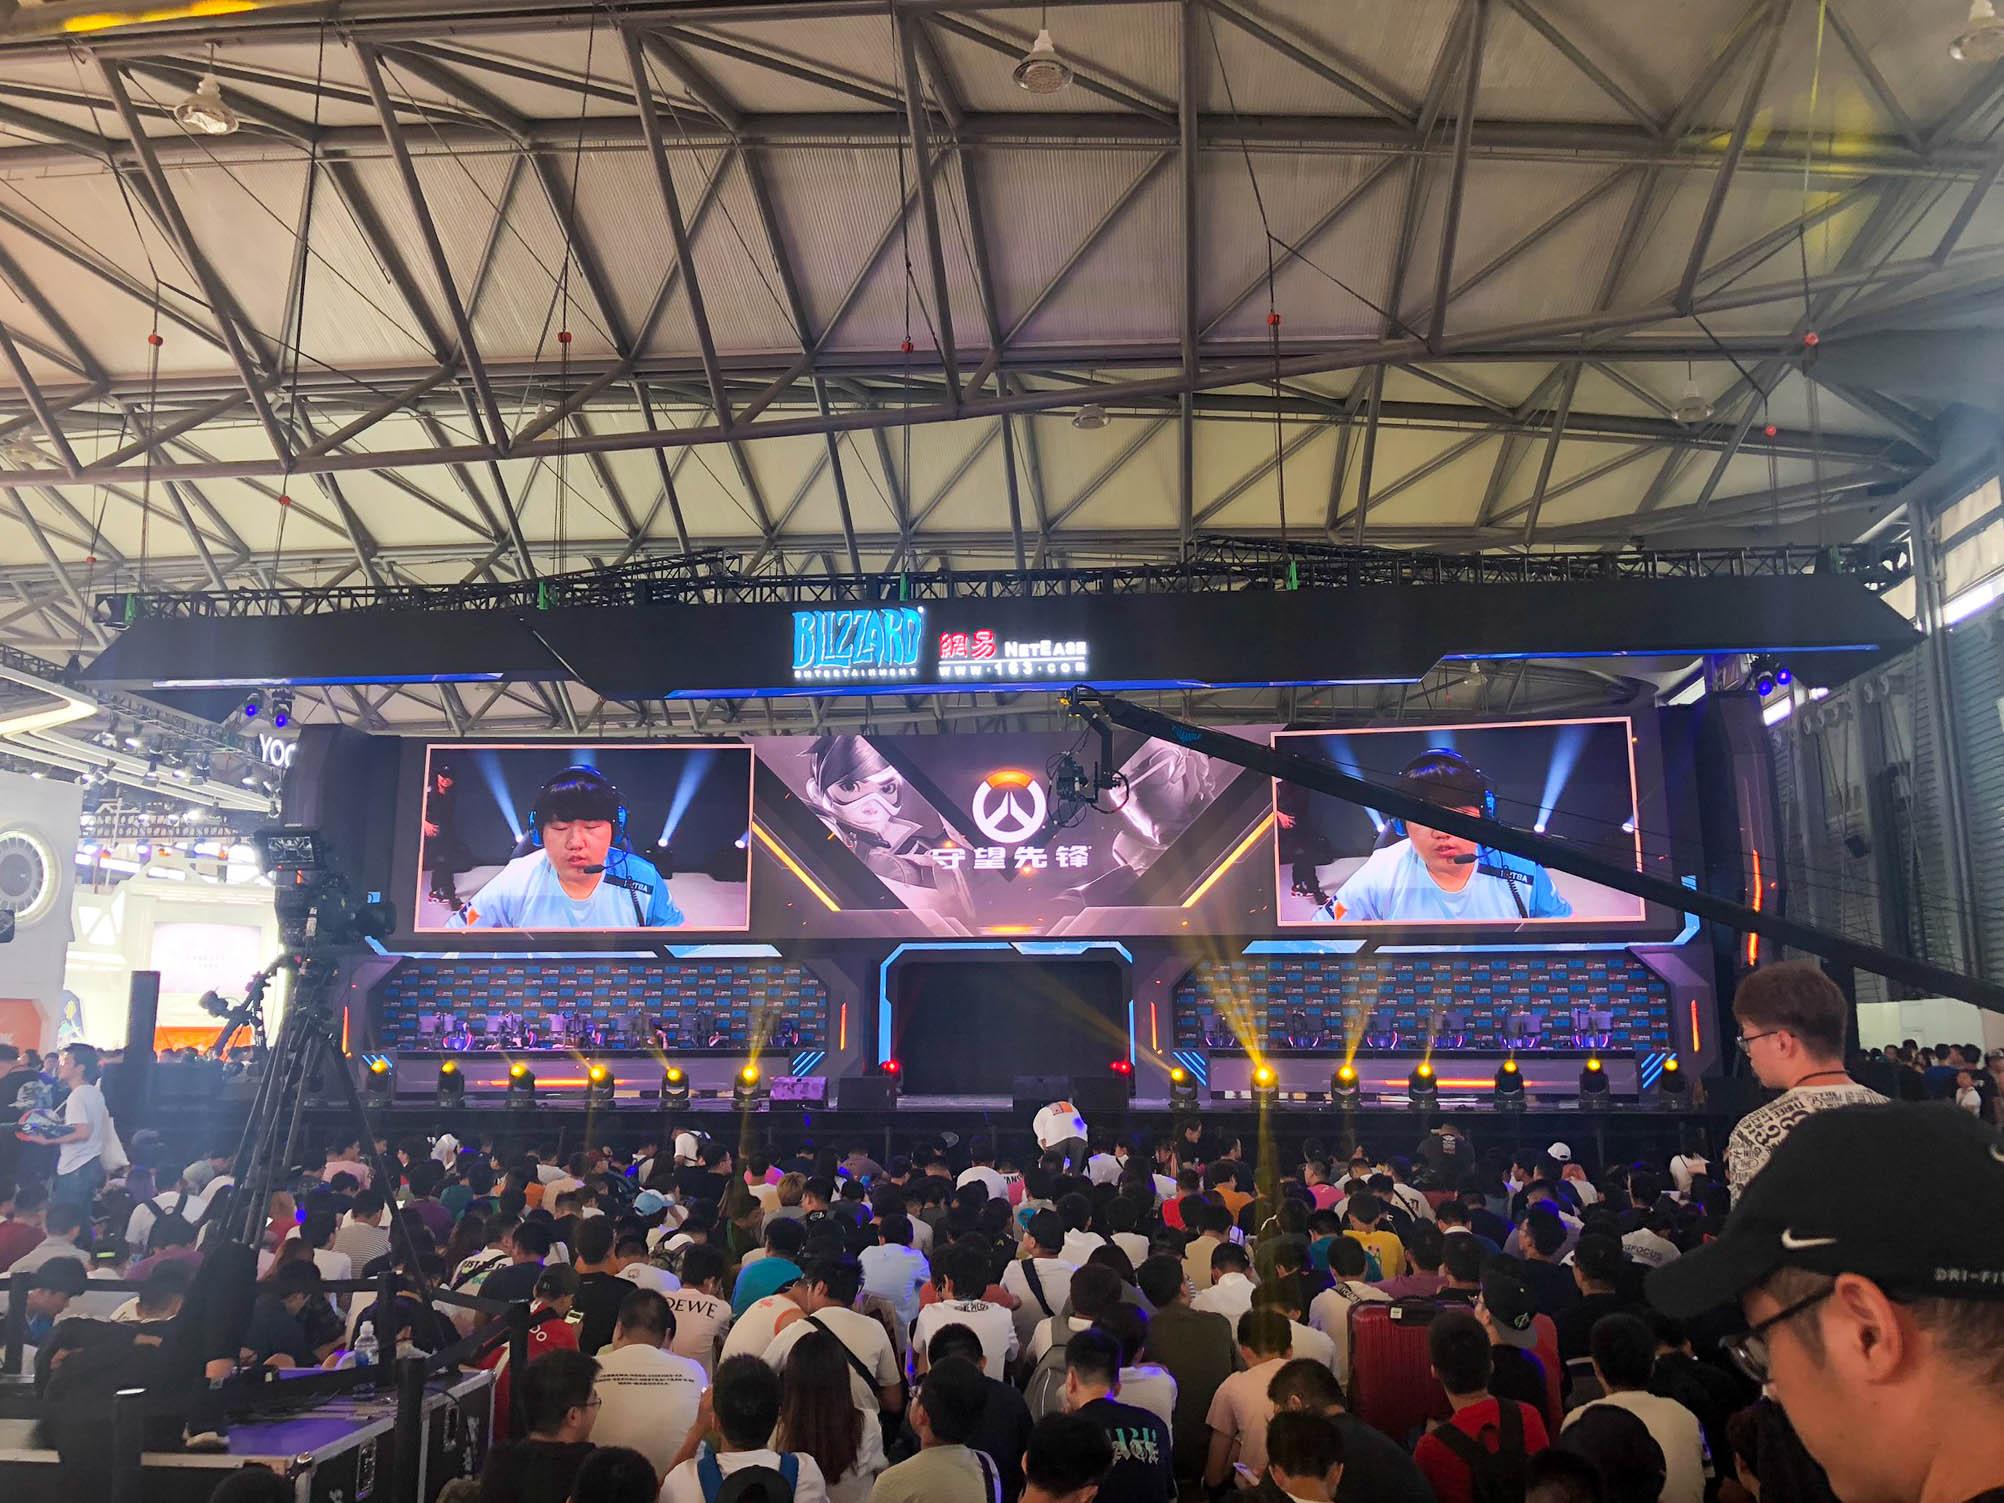 2019 ChinaJoy 中国国际数码互动娱乐展览会 游玩 第50张